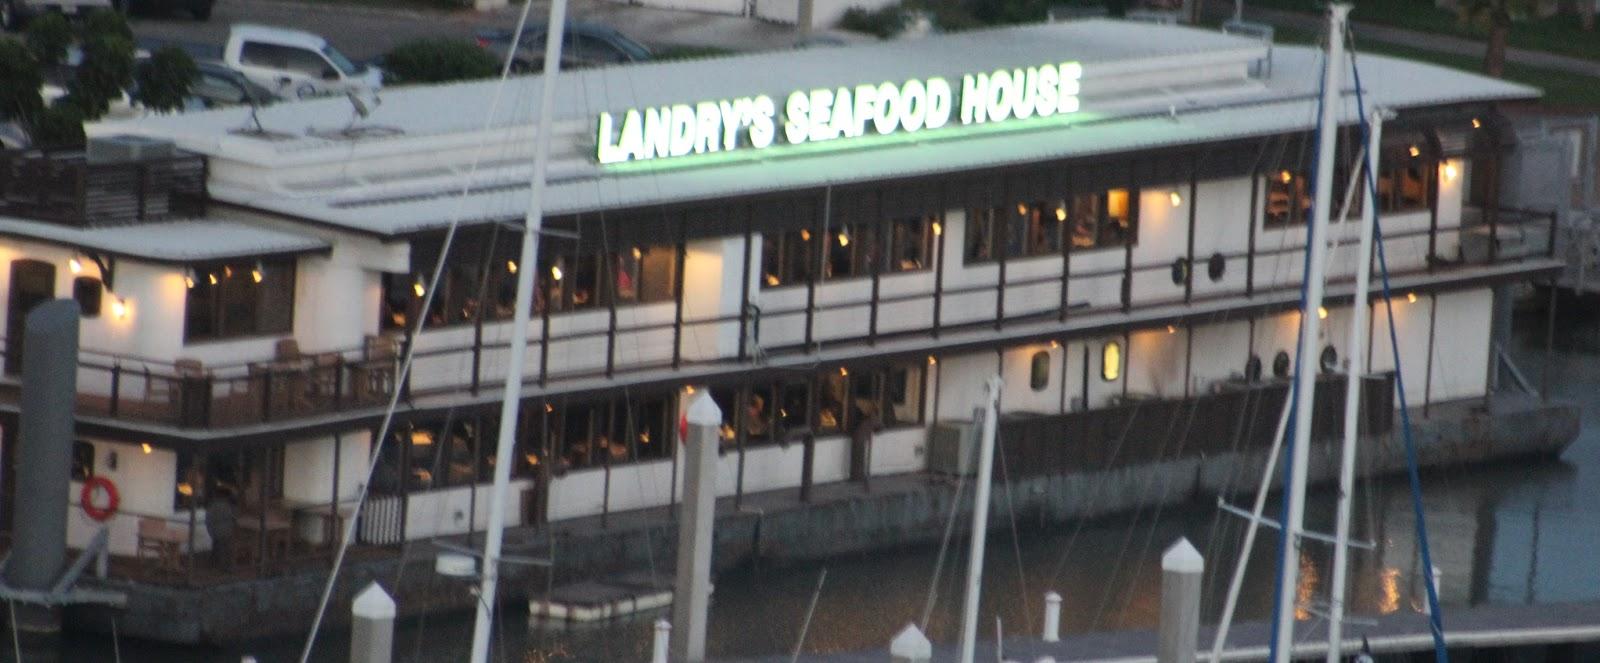 Below Landry S Seafood House Floating Barge Restaurant Corpus Christi Texas 20 June 2016